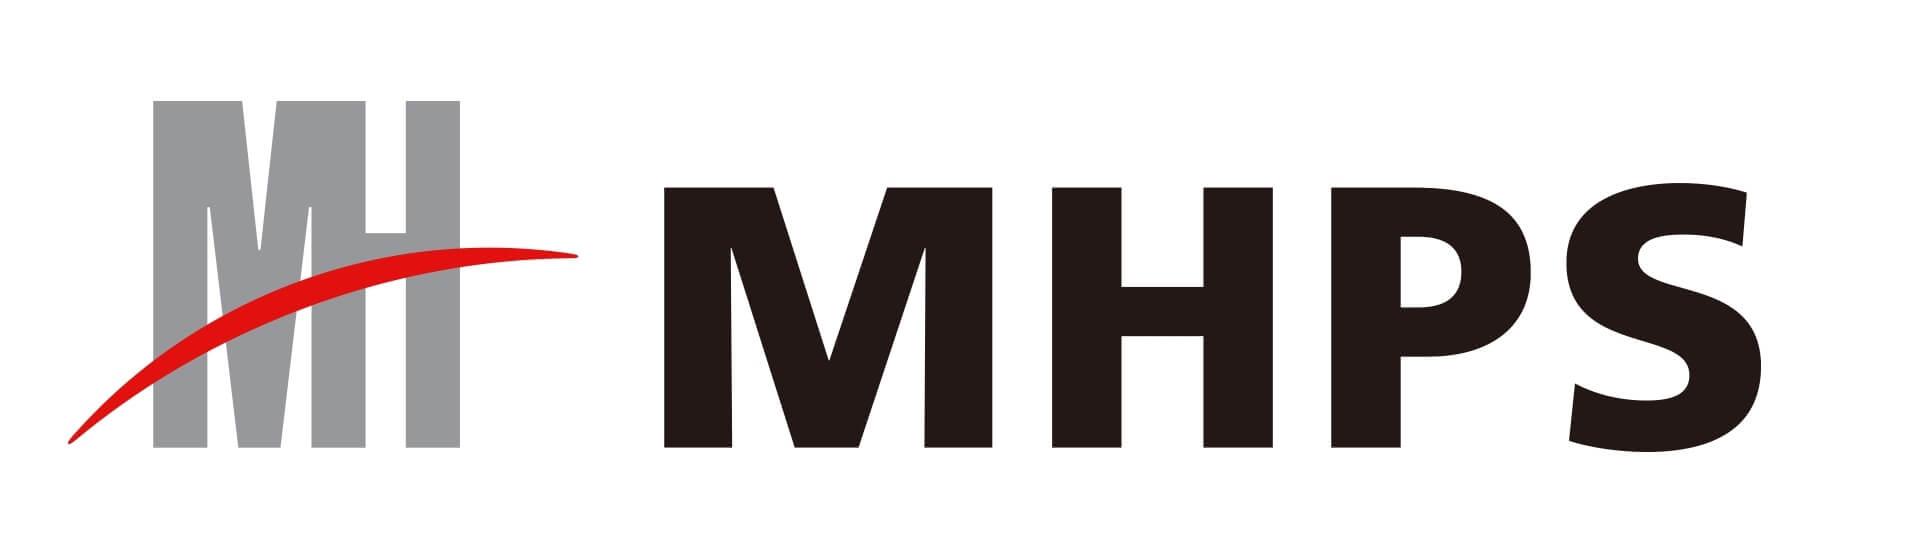 MHPS Logo